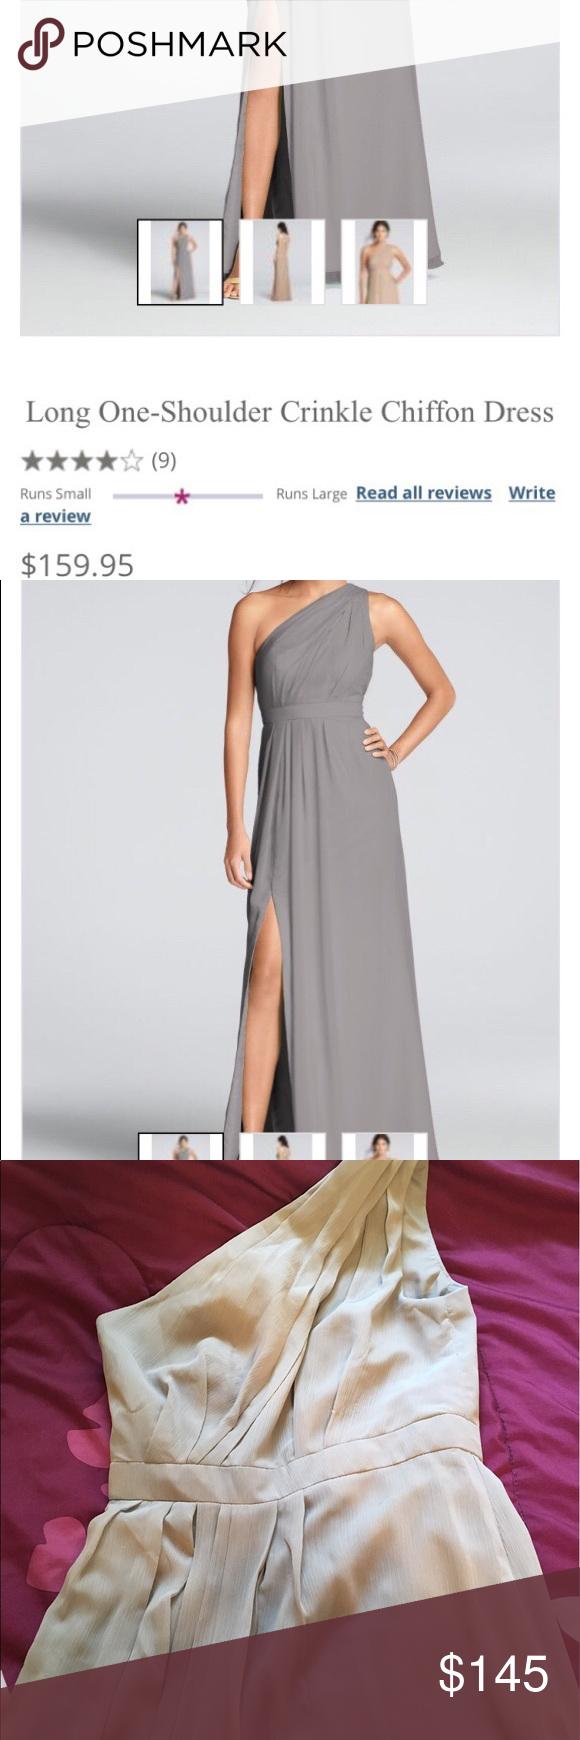 Long oneshoulder crinkle chiffon dress